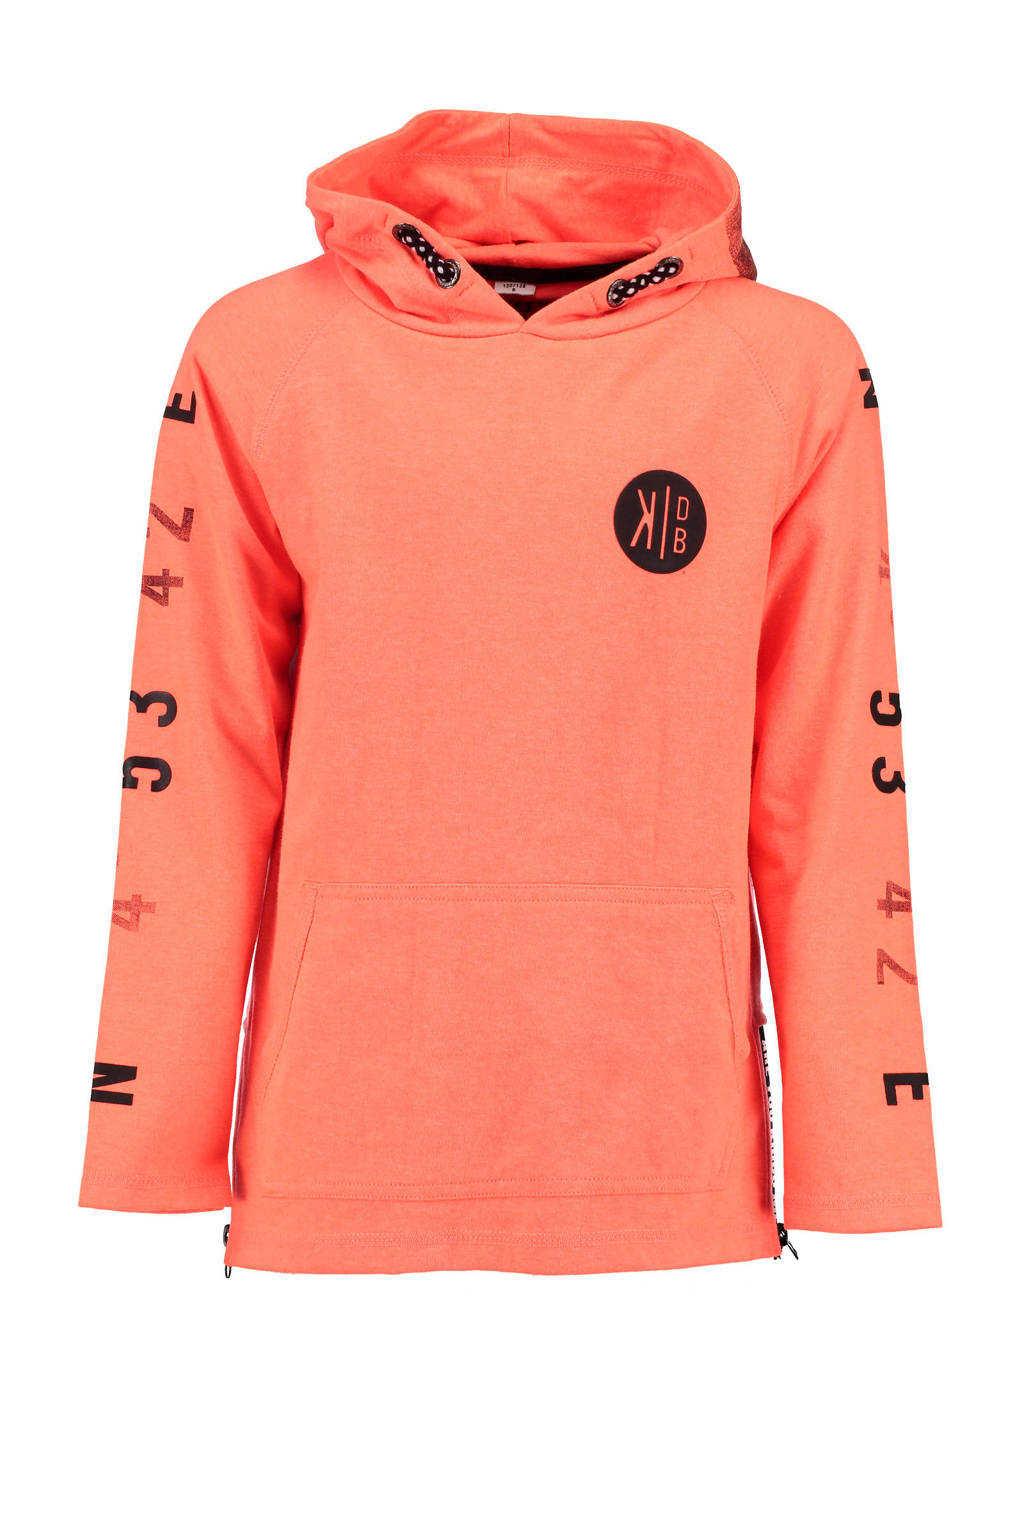 KIDDO hoodie met printopdruk oranje, Oranje